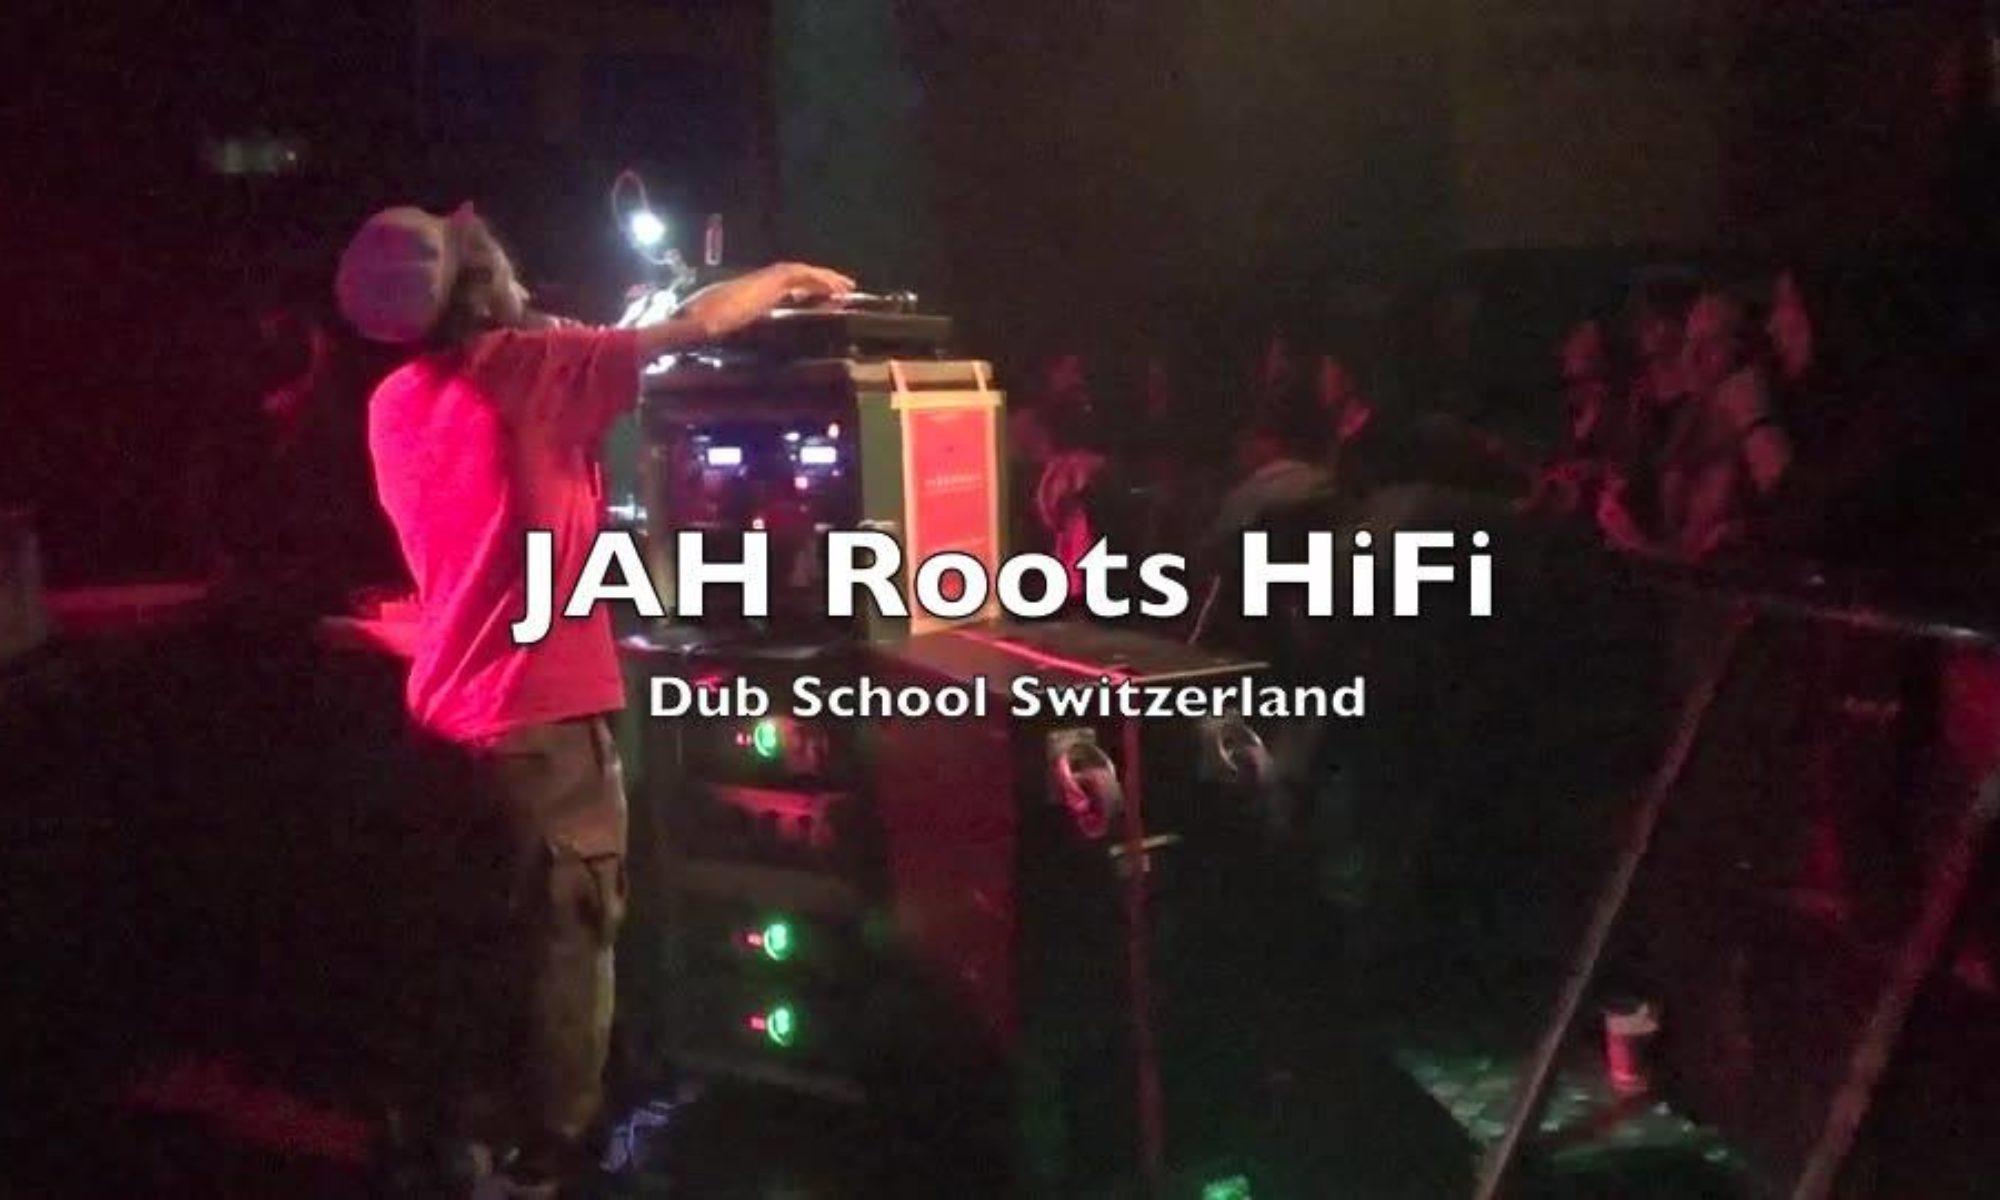 Jahroots Hifi